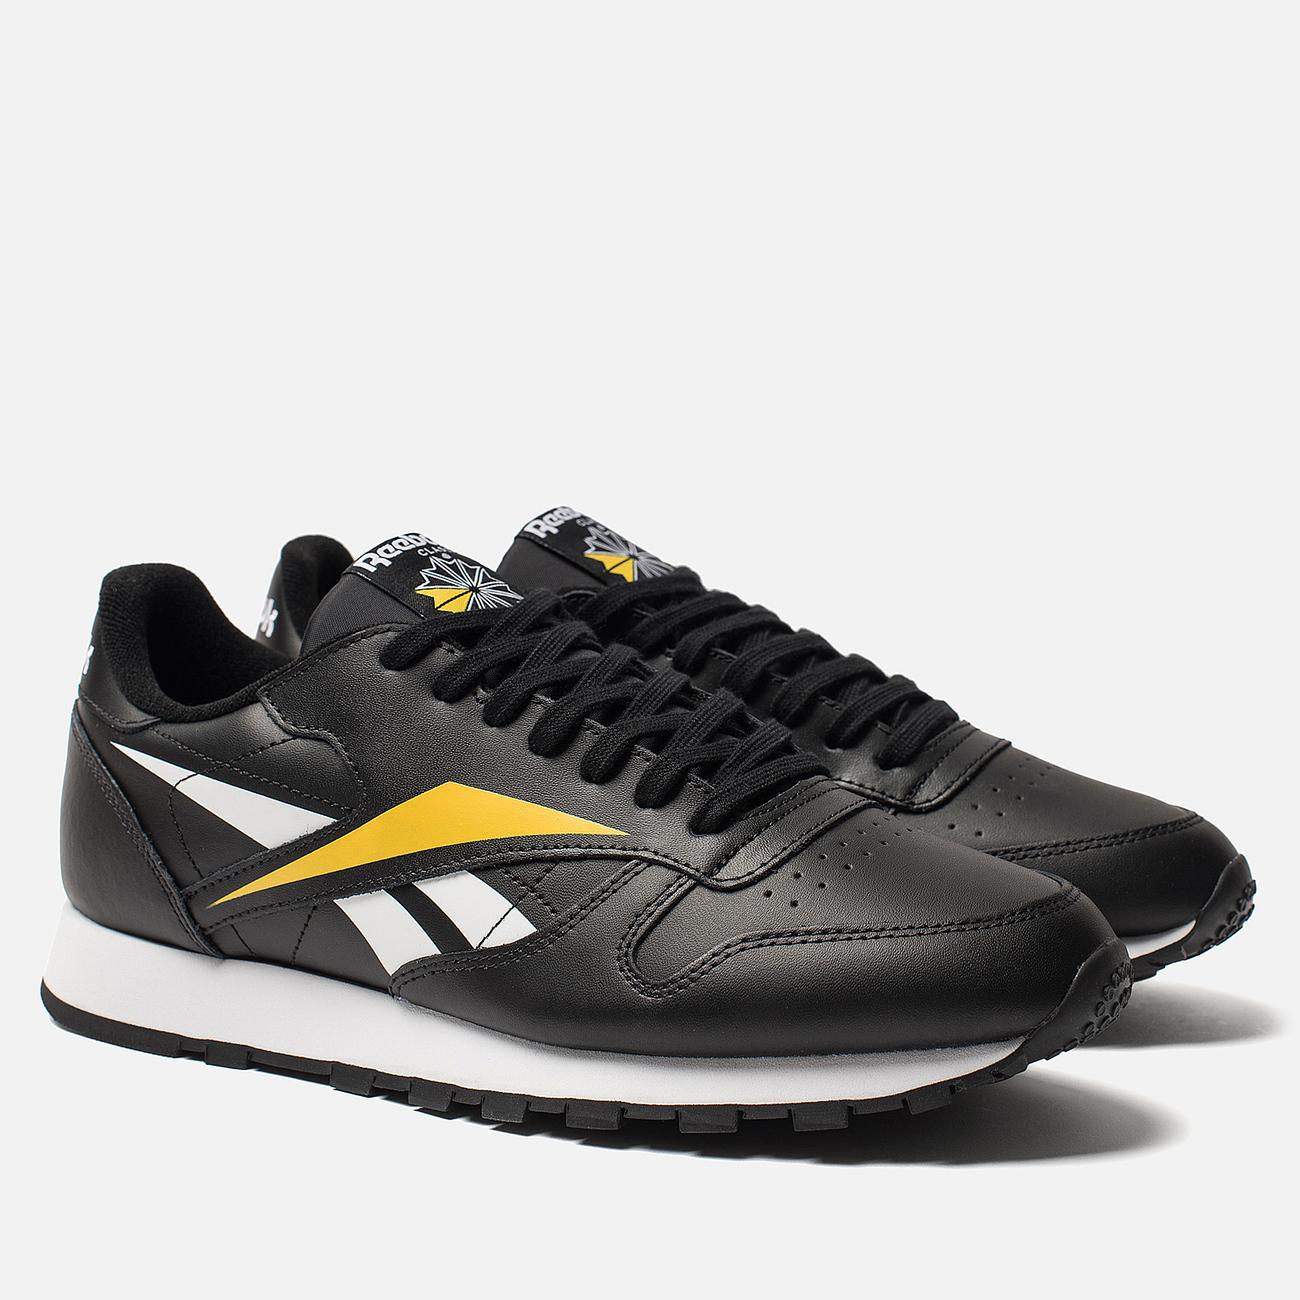 Мужские кроссовки Reebok Classic Leather Vector Black/White/Toxic Yellow